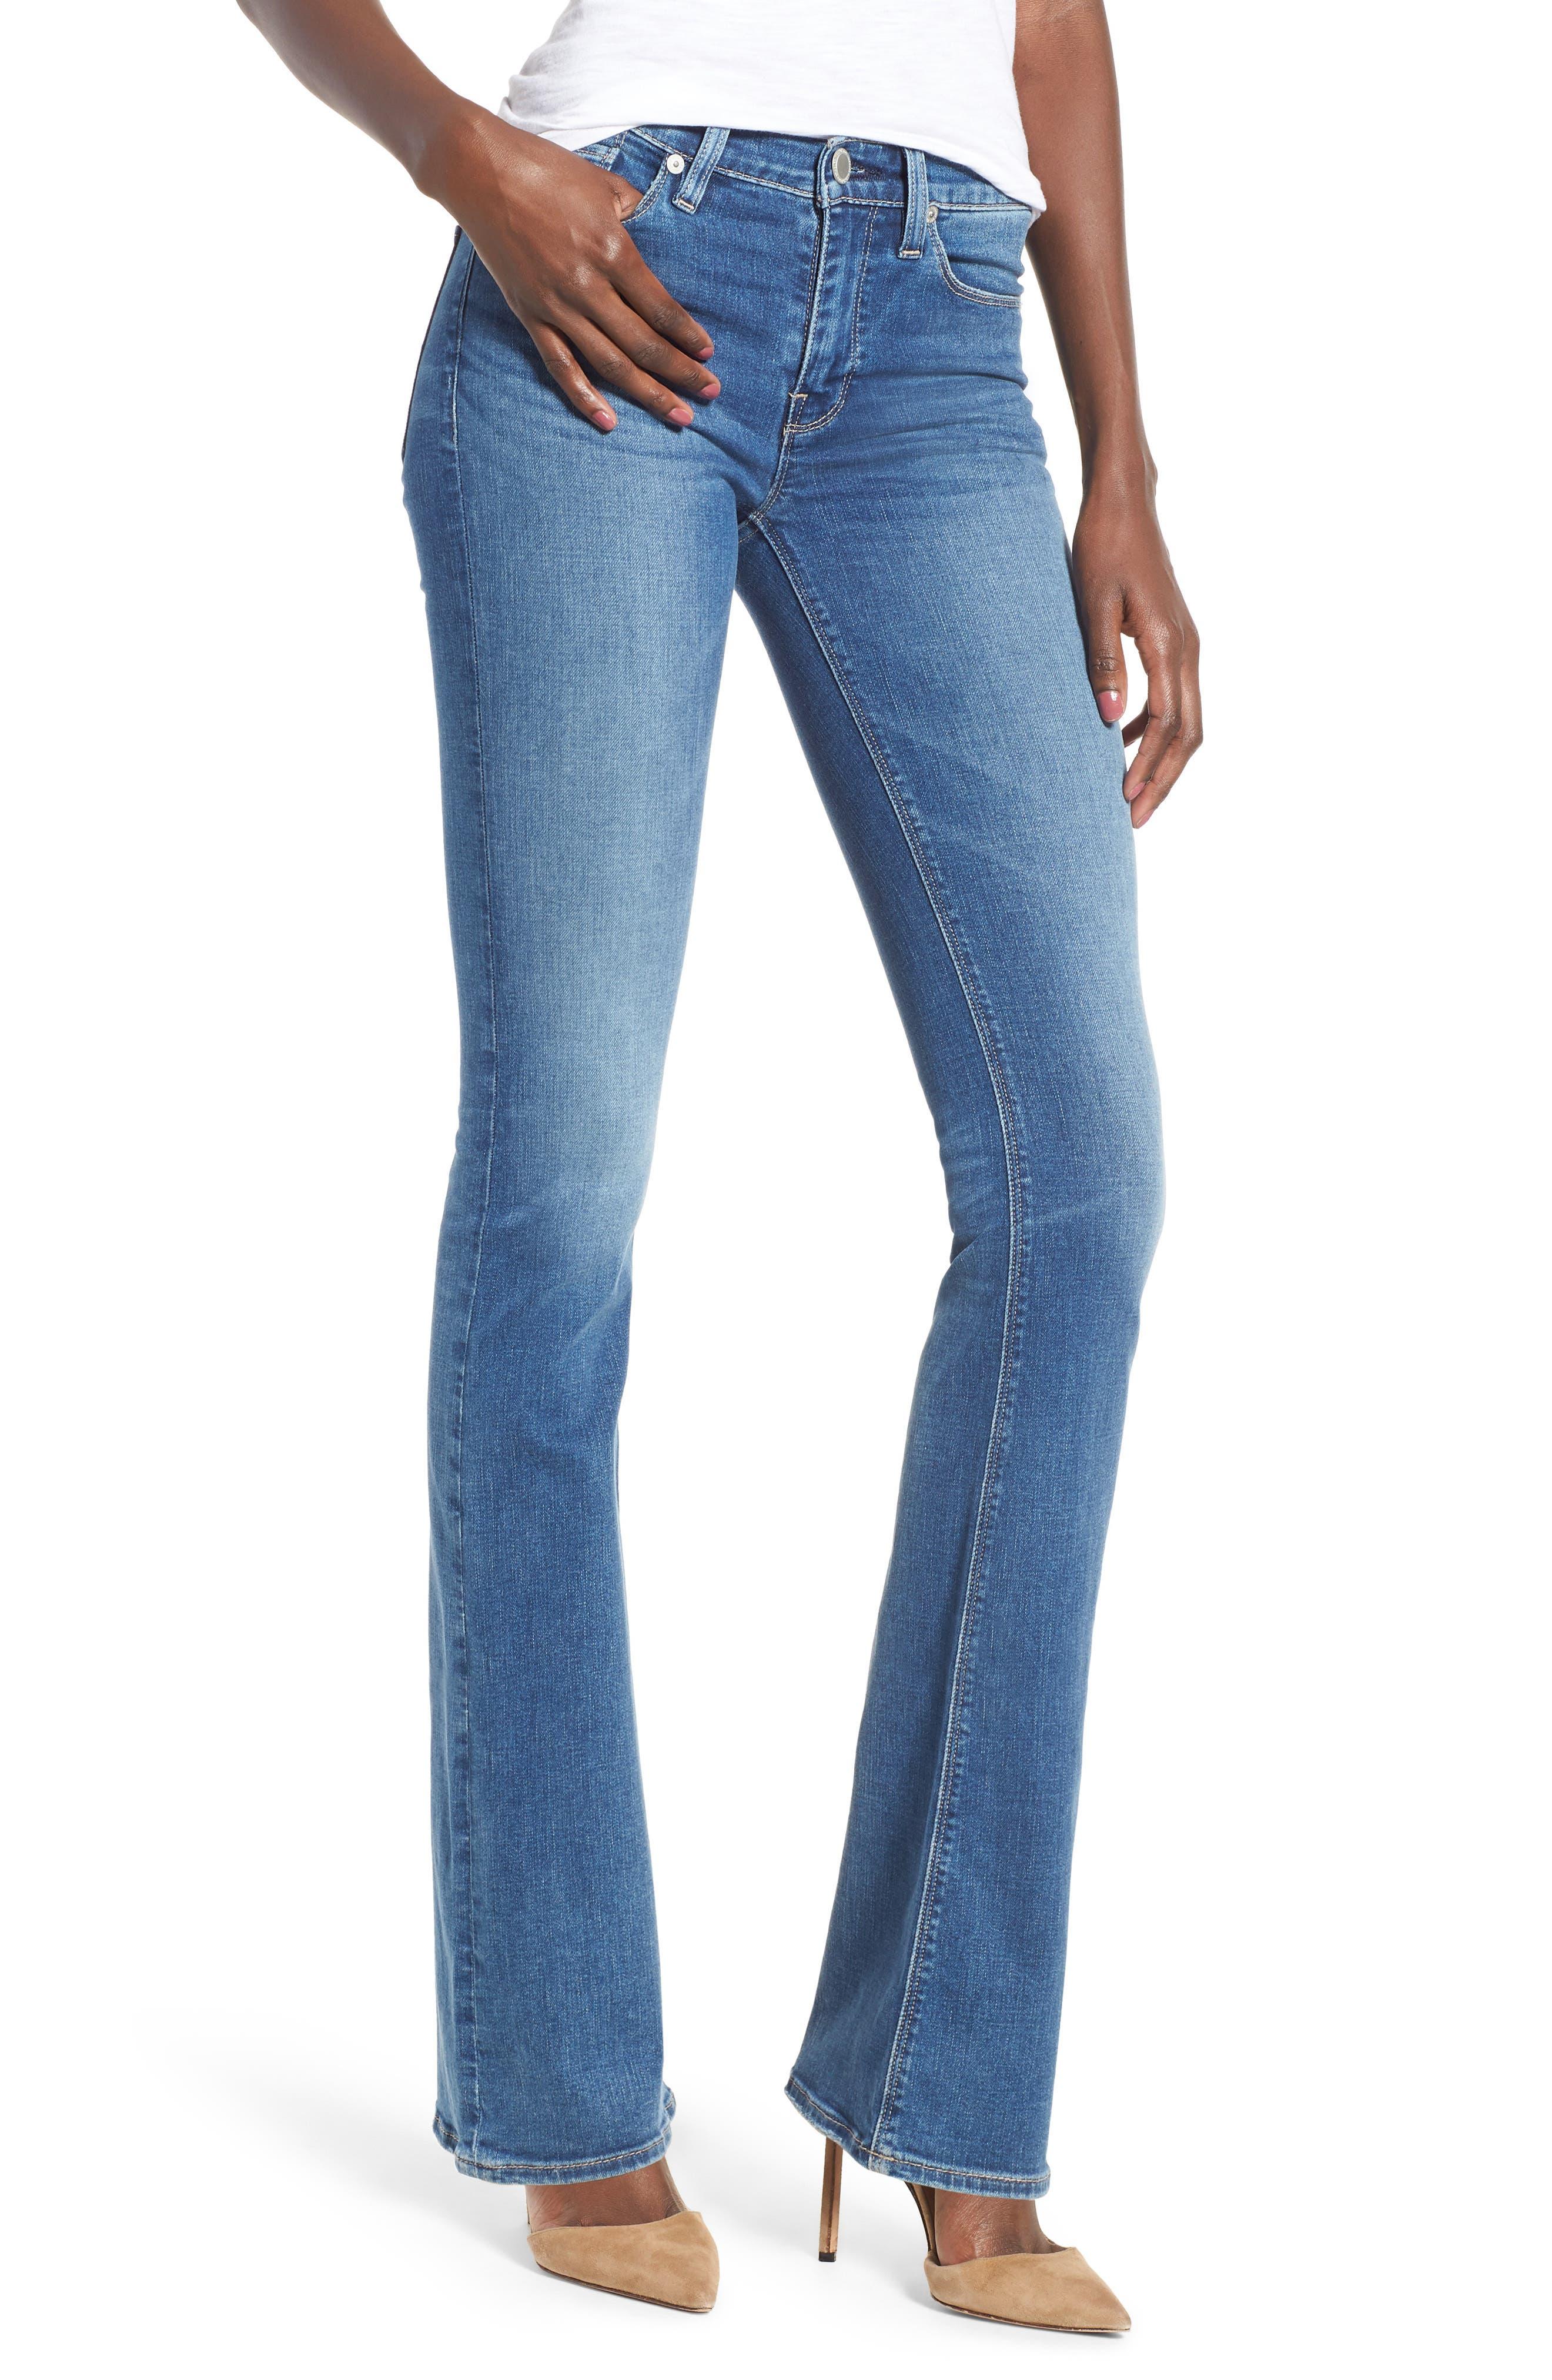 HUDSON JEANS Drew Bootcut Jeans, Main, color, AYON